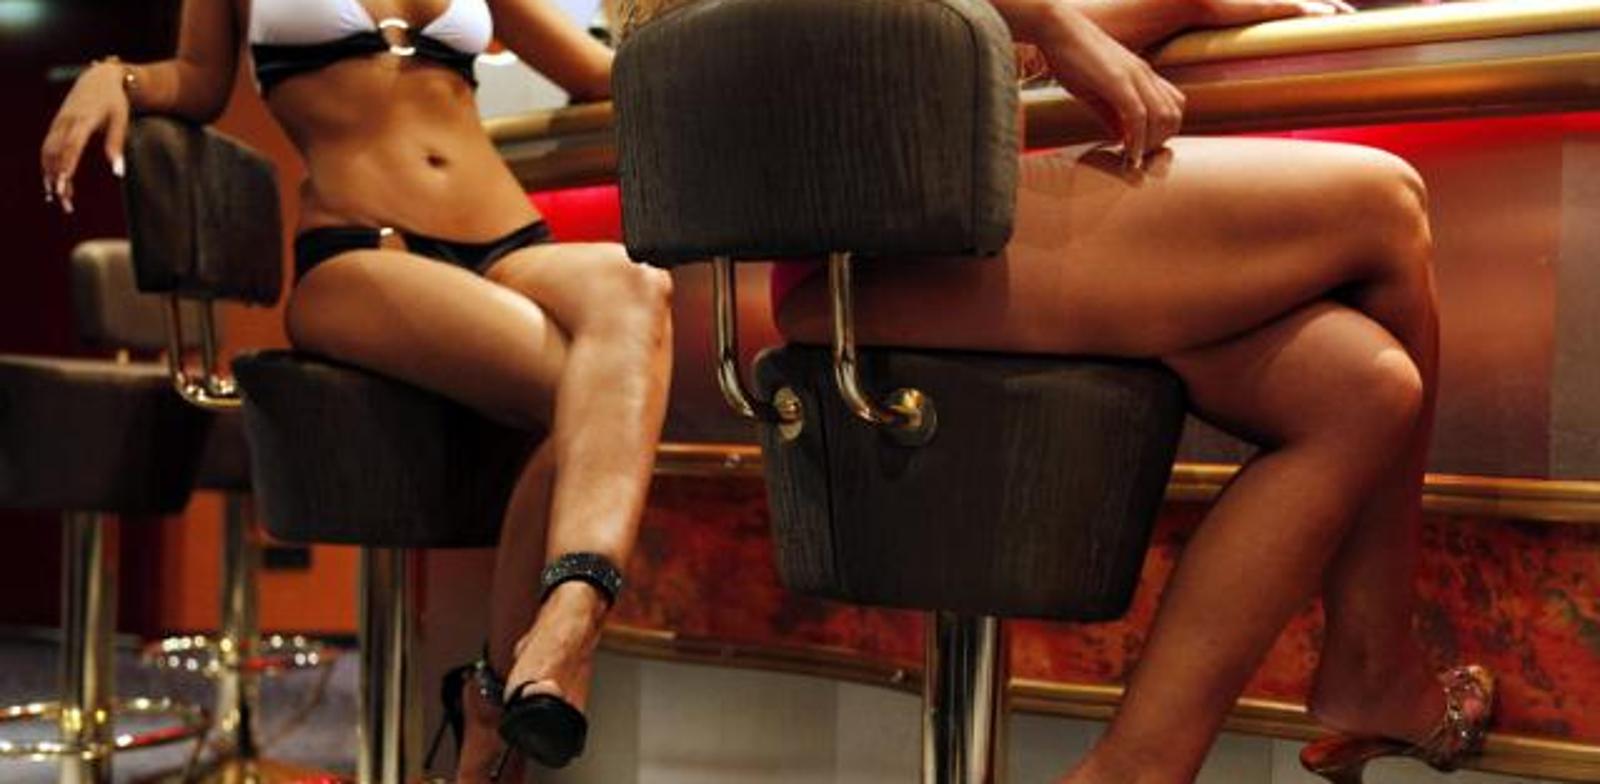 sexo con venezolanas galeria de gordas putas